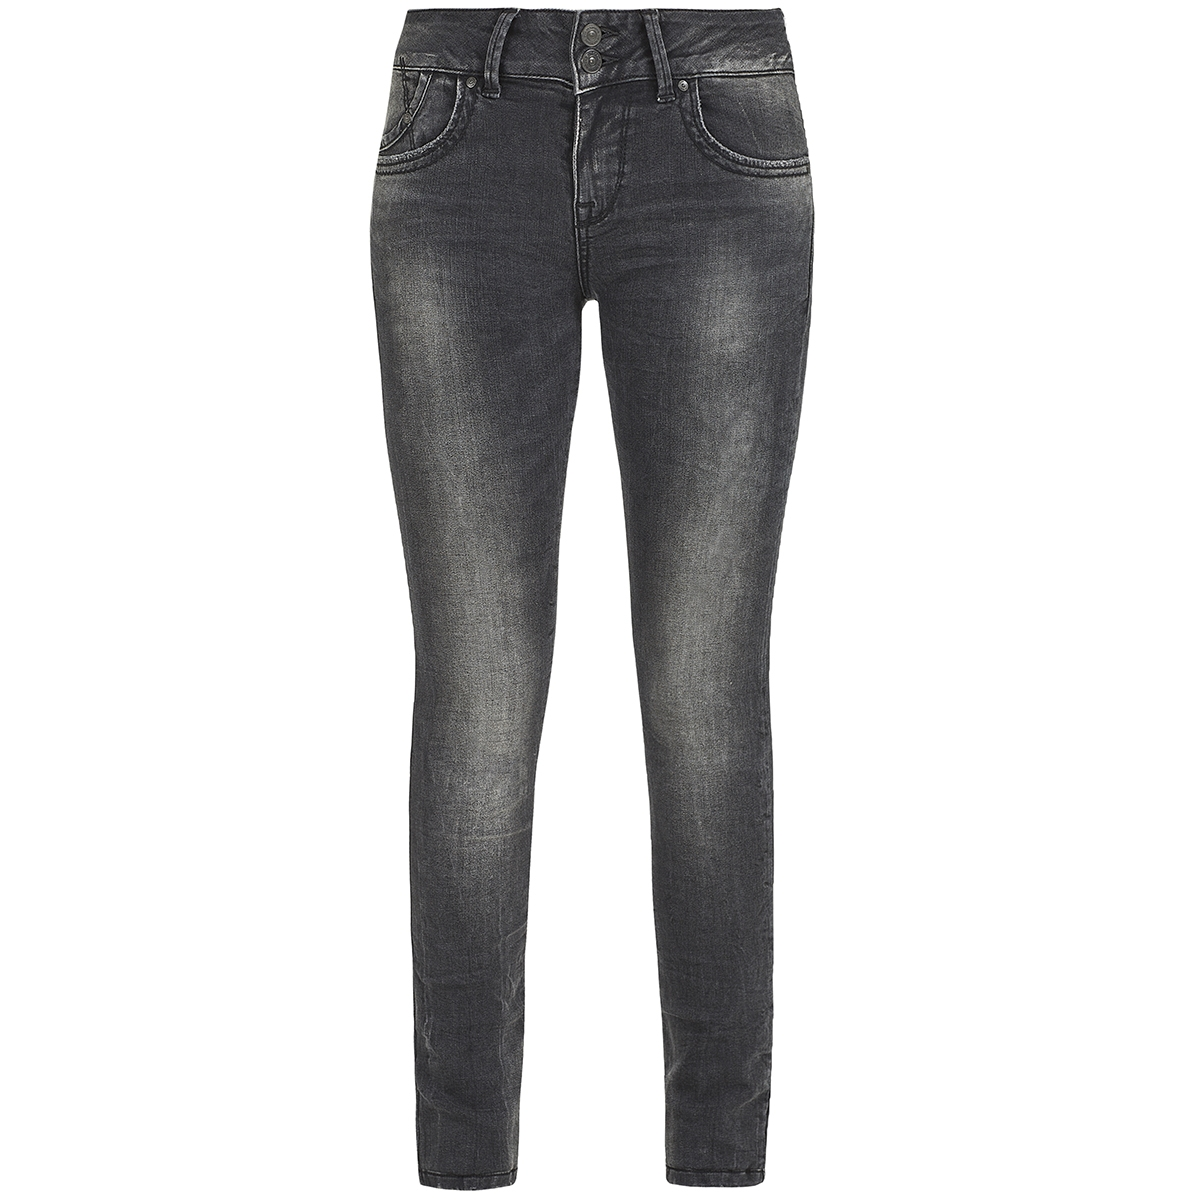 molly high waist 1009 50982 13775 ltb jeans 50982 vista black